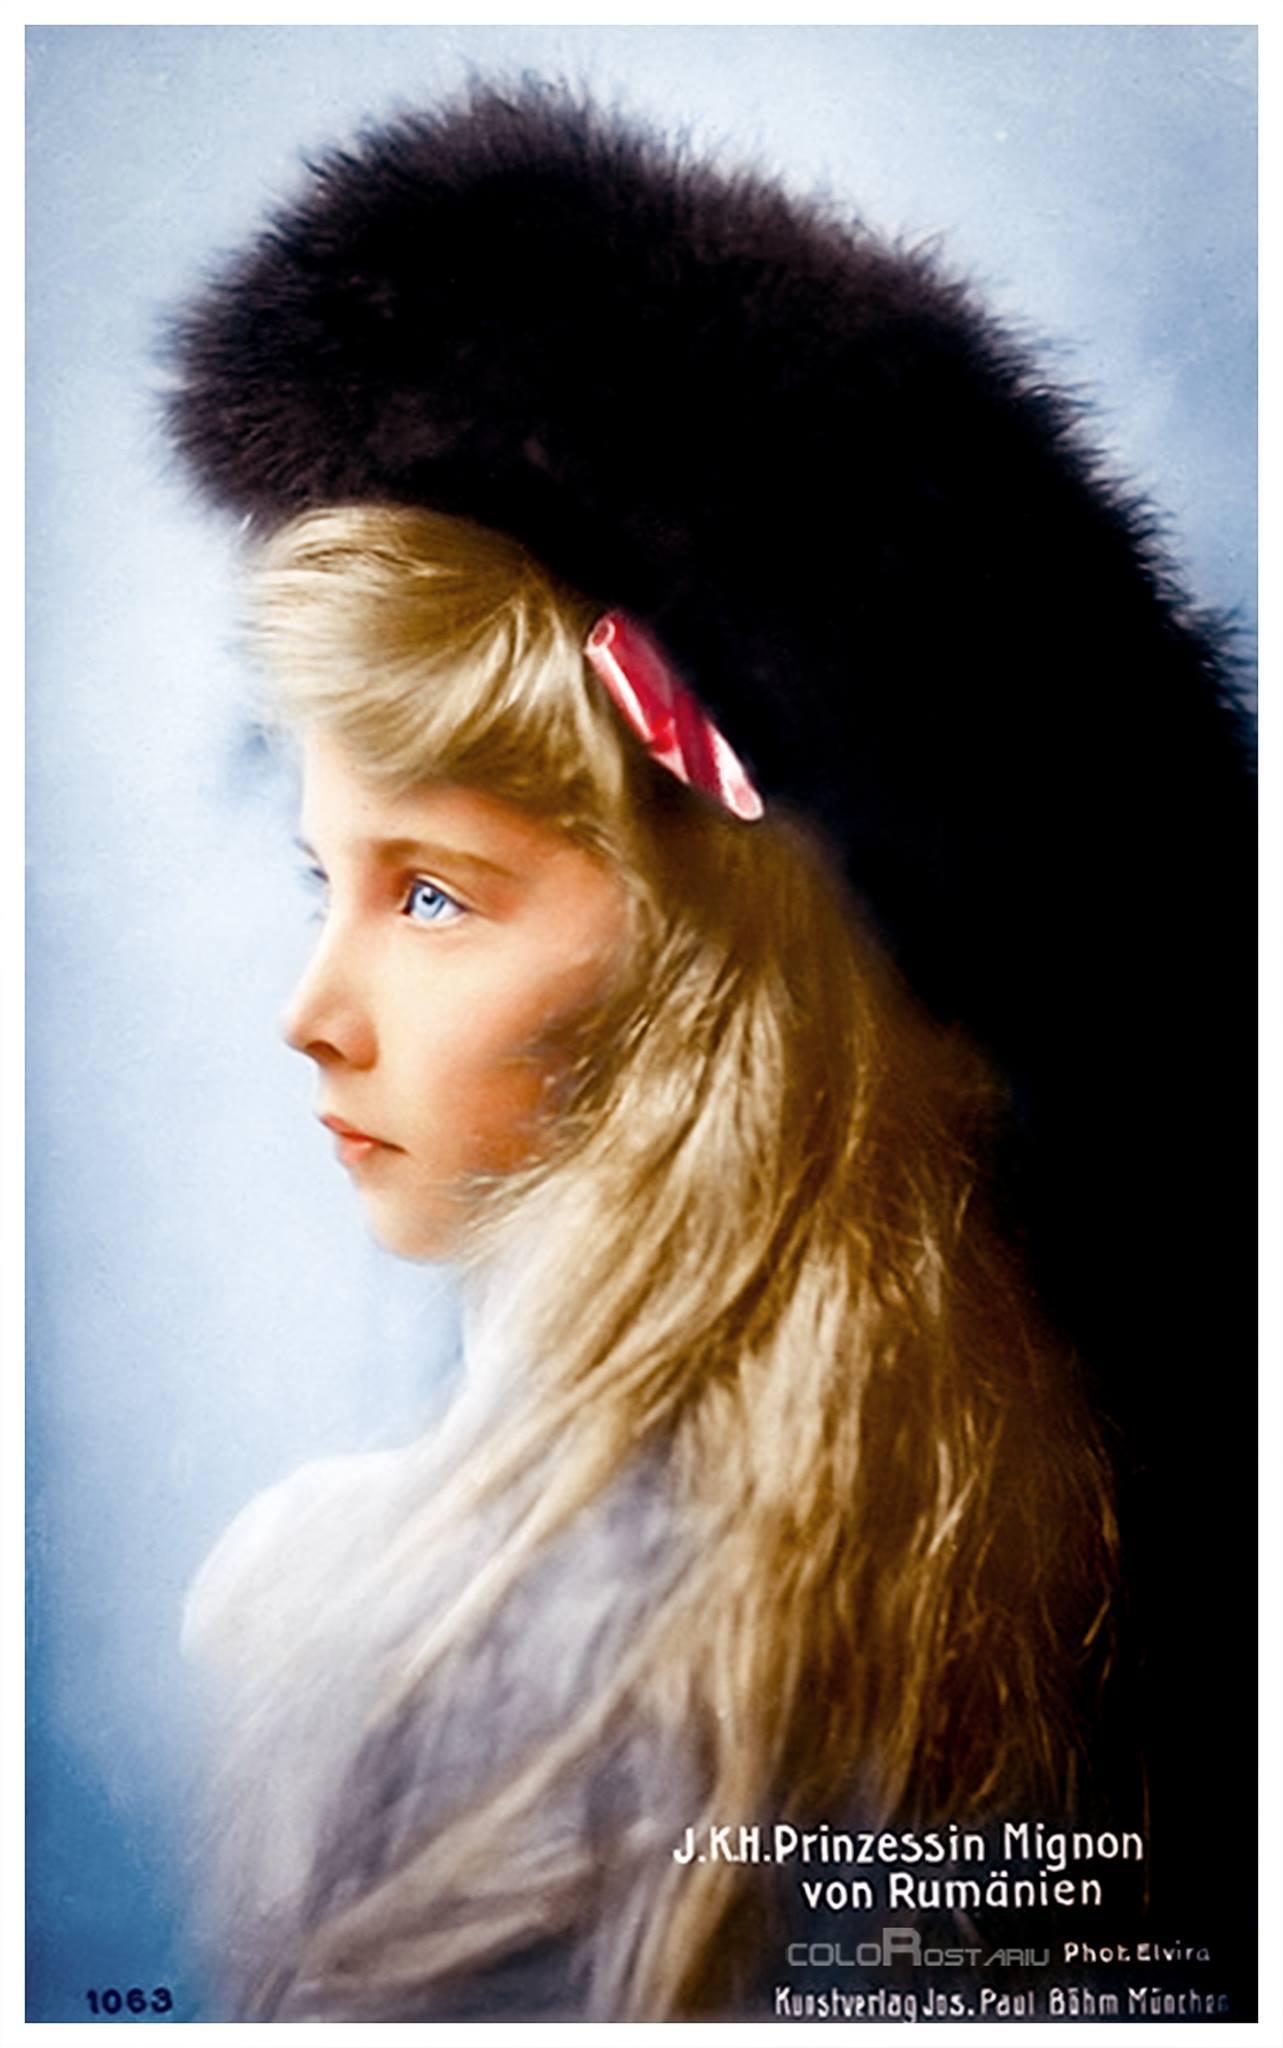 maria-princess-of-romania-future-queen-of-yugoslavia-marija-karadordevic-mignon-marie-of-edinburgh-ferdinand-of-romania-belgrade.jpg